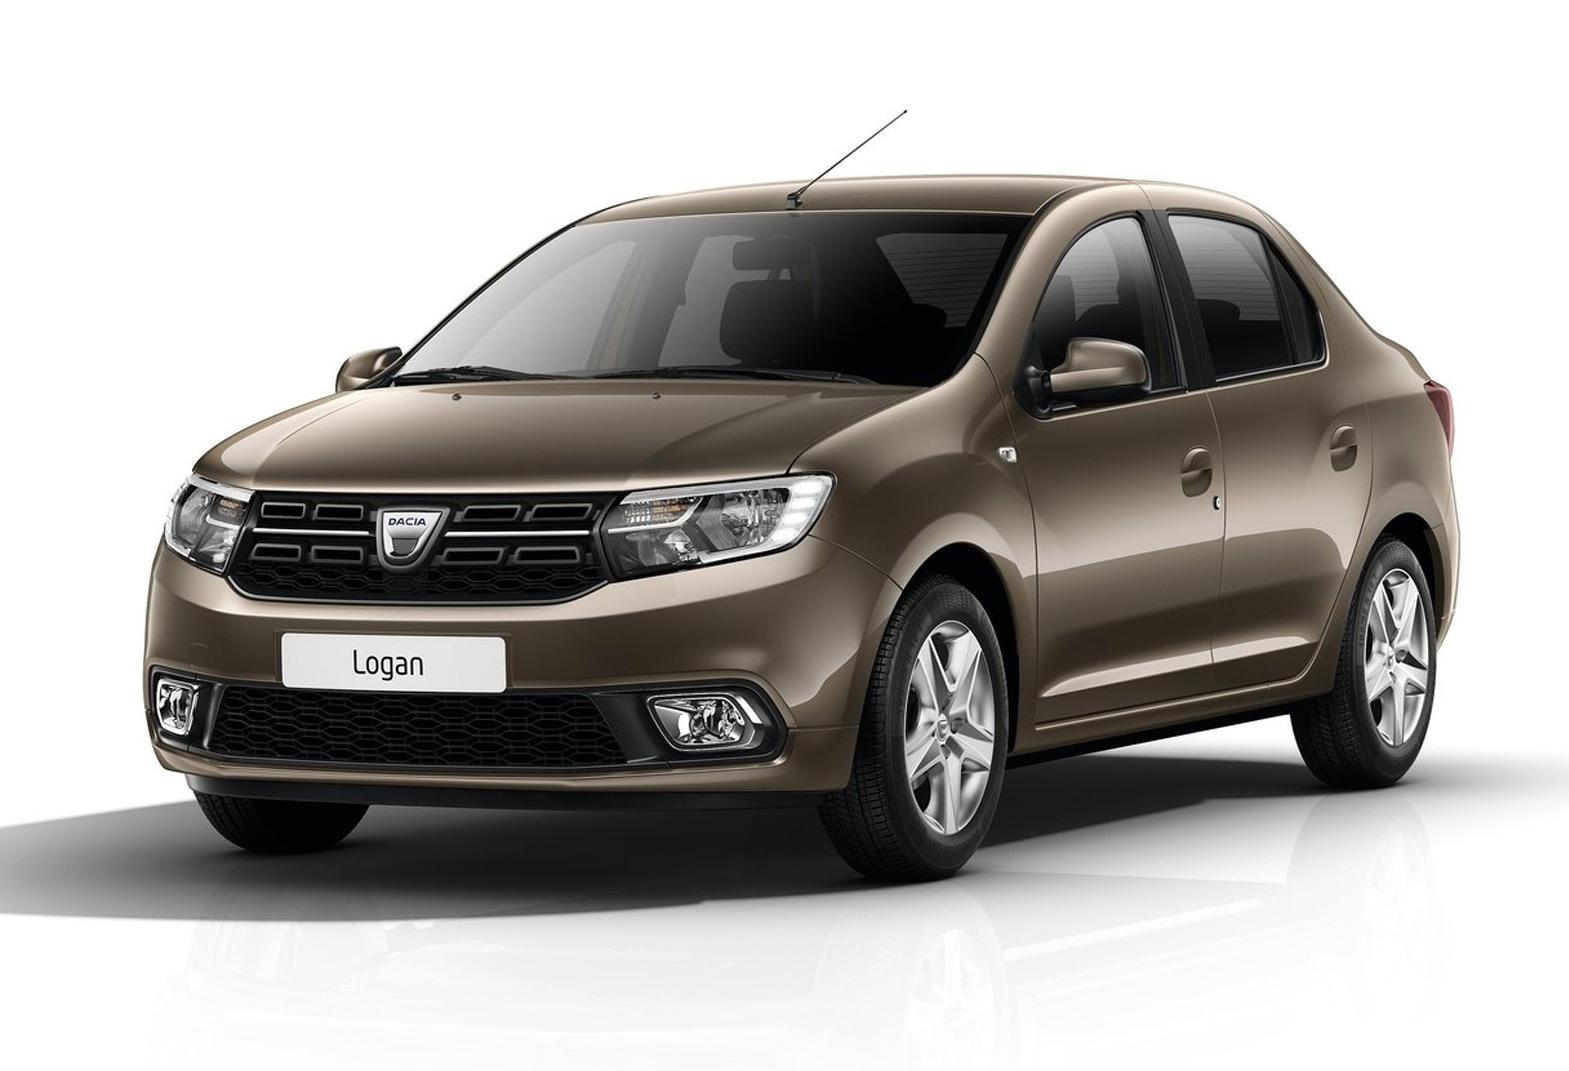 Dacia Logan – Model Nou 2020. Inchirieri Auto Masini Ieftine Bucuresti, Aeroport Otopeni – Oferte speciale la inchiriere!